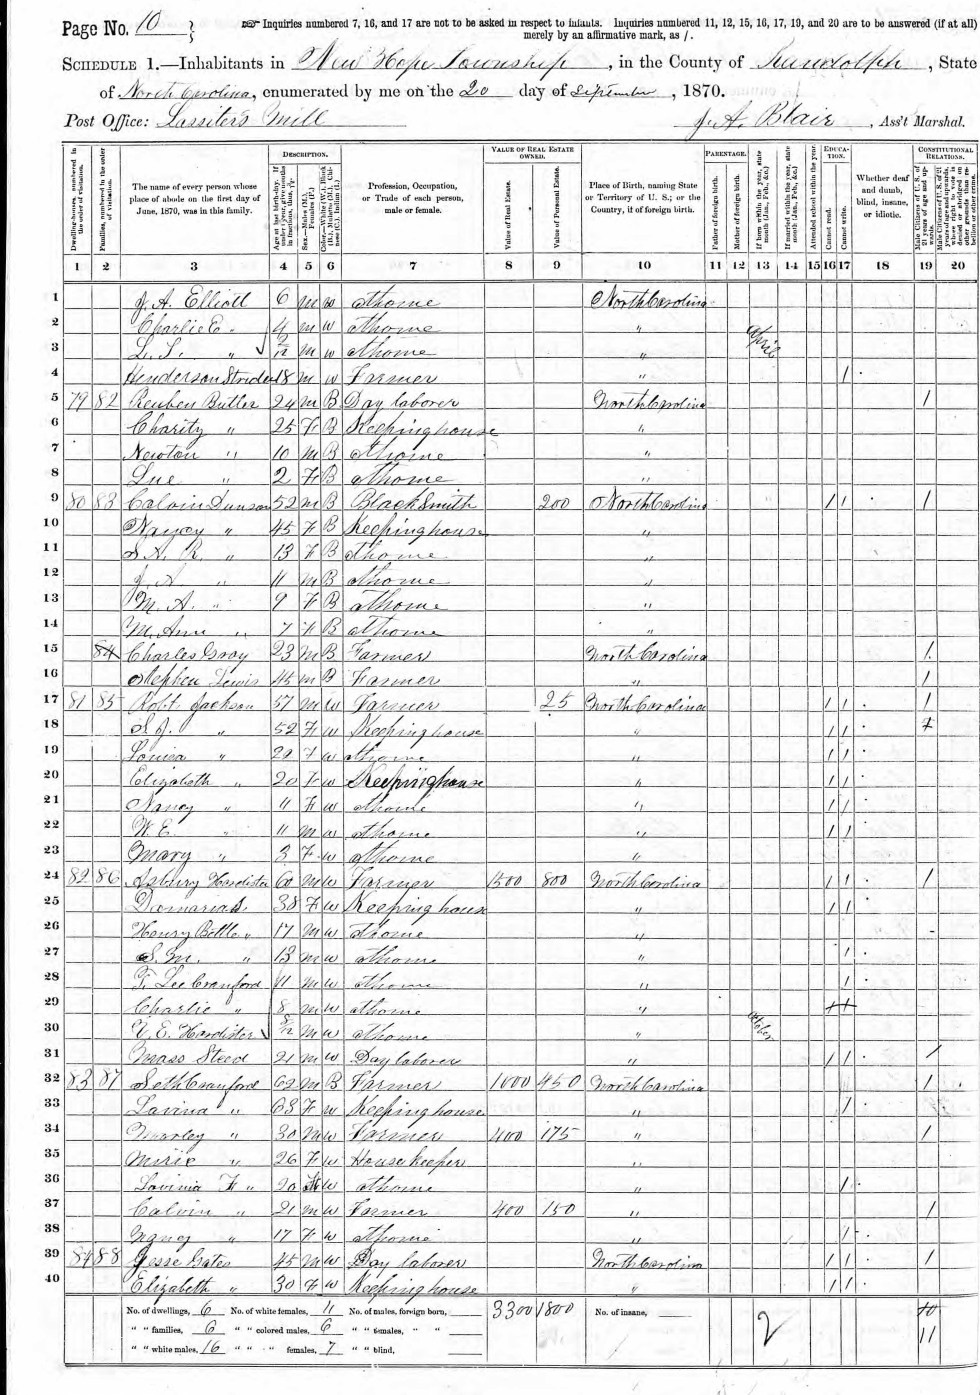 Nancy Dunson 1870 census